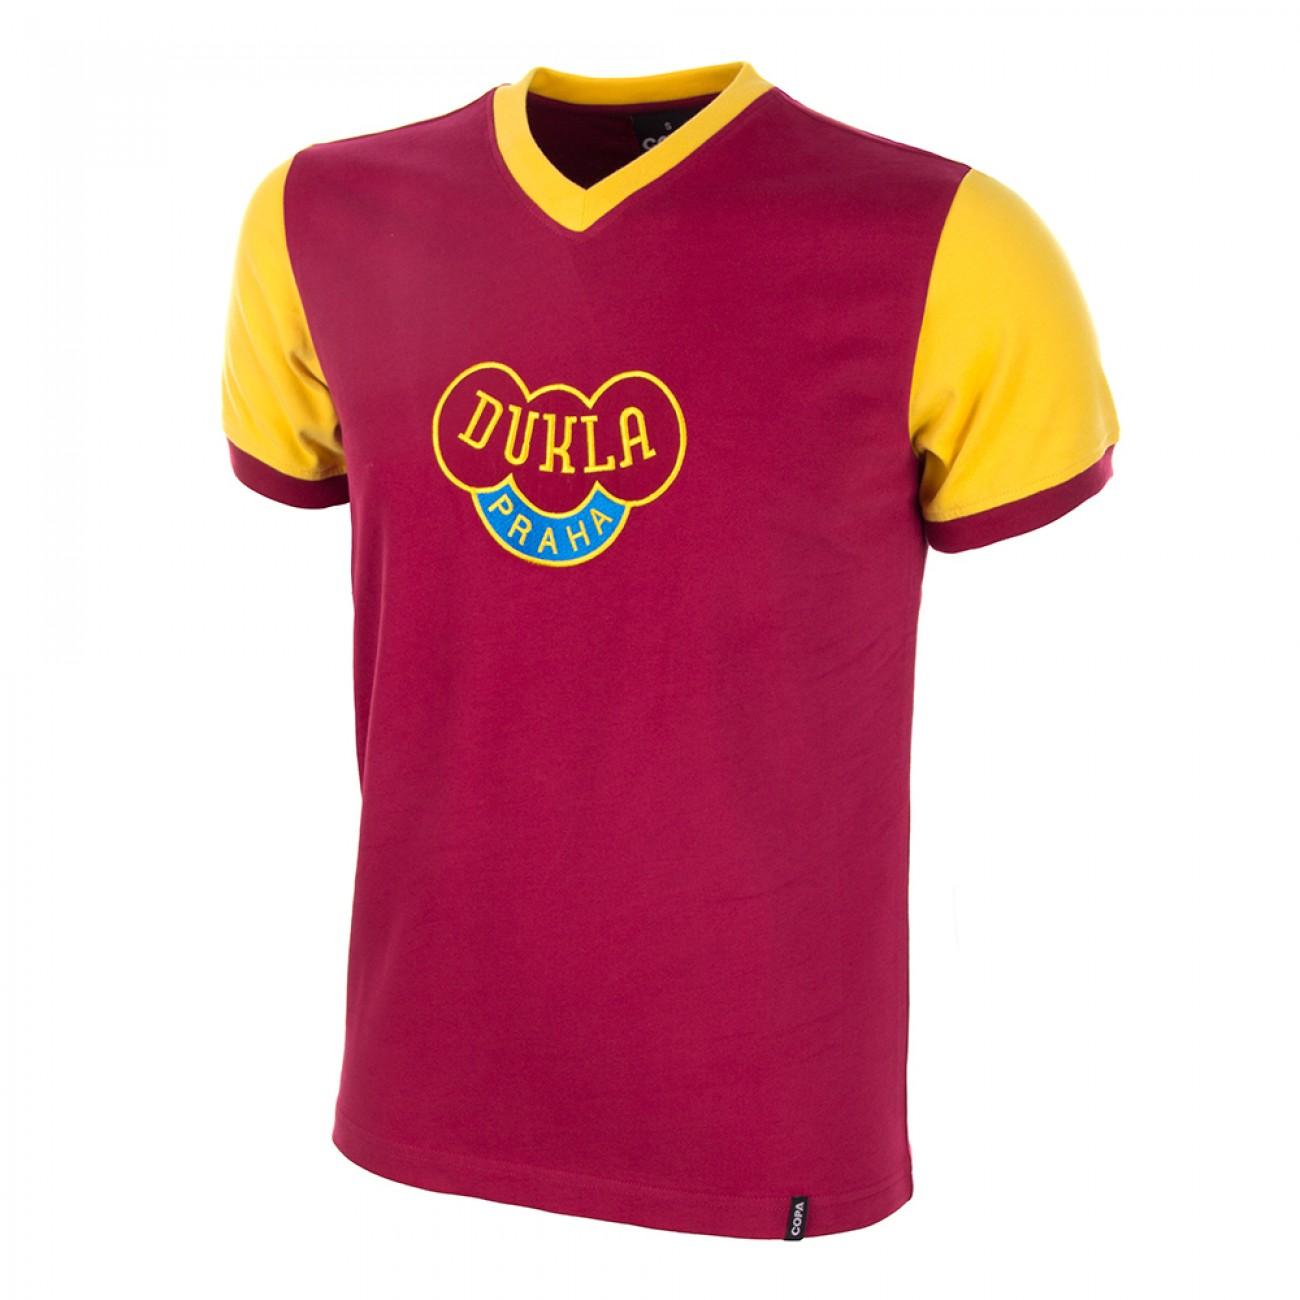 http://www.retrofootball.es/ropa-de-futbol/camiseta-dukla-praga-a-os-60.html